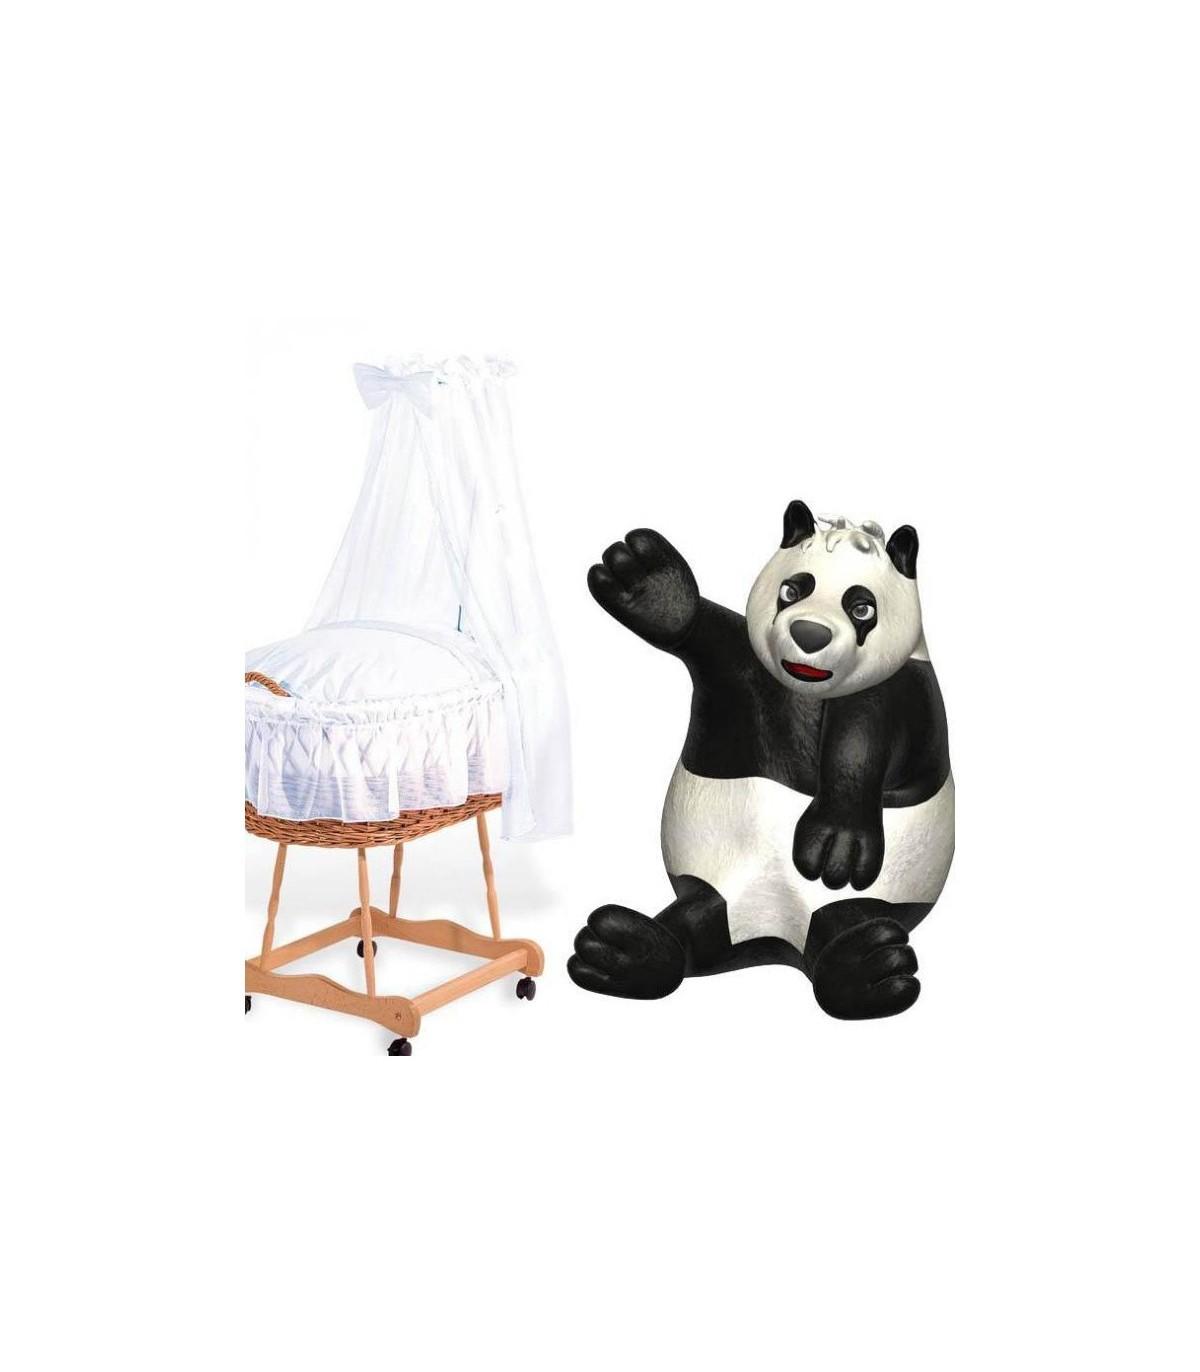 Sticker panda animal